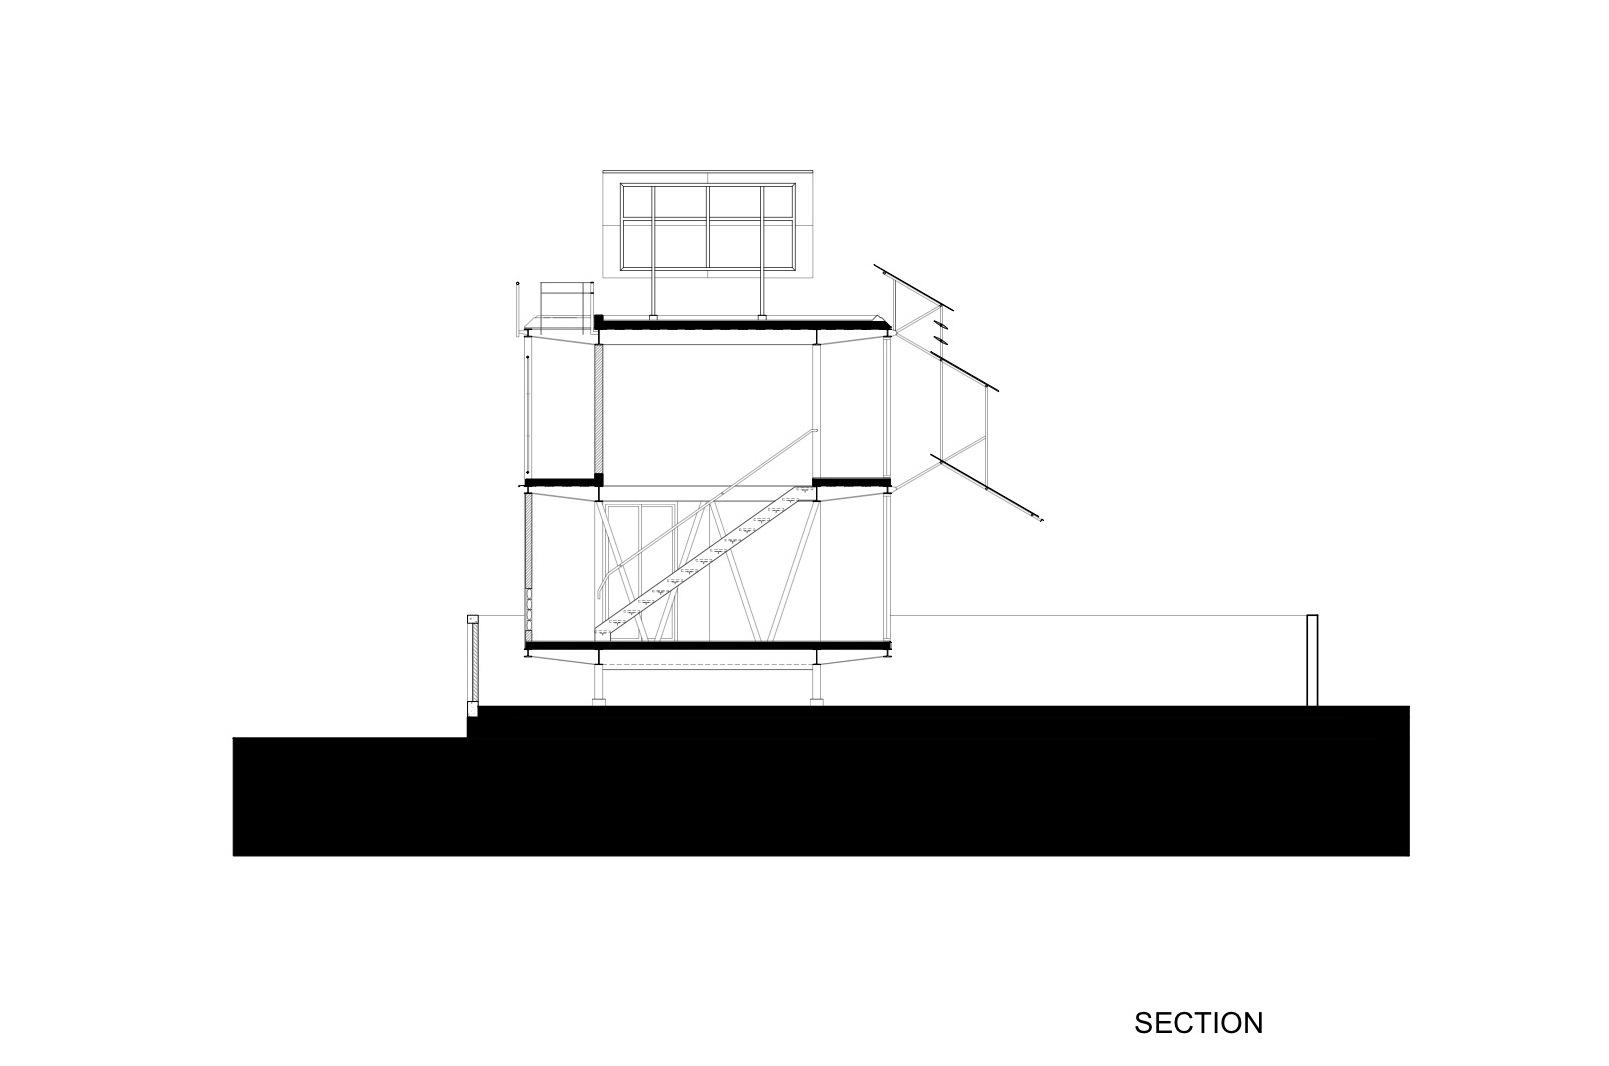 Galer a de oficinas estudios de arquitectura 6 for Oficinas de arquitectura